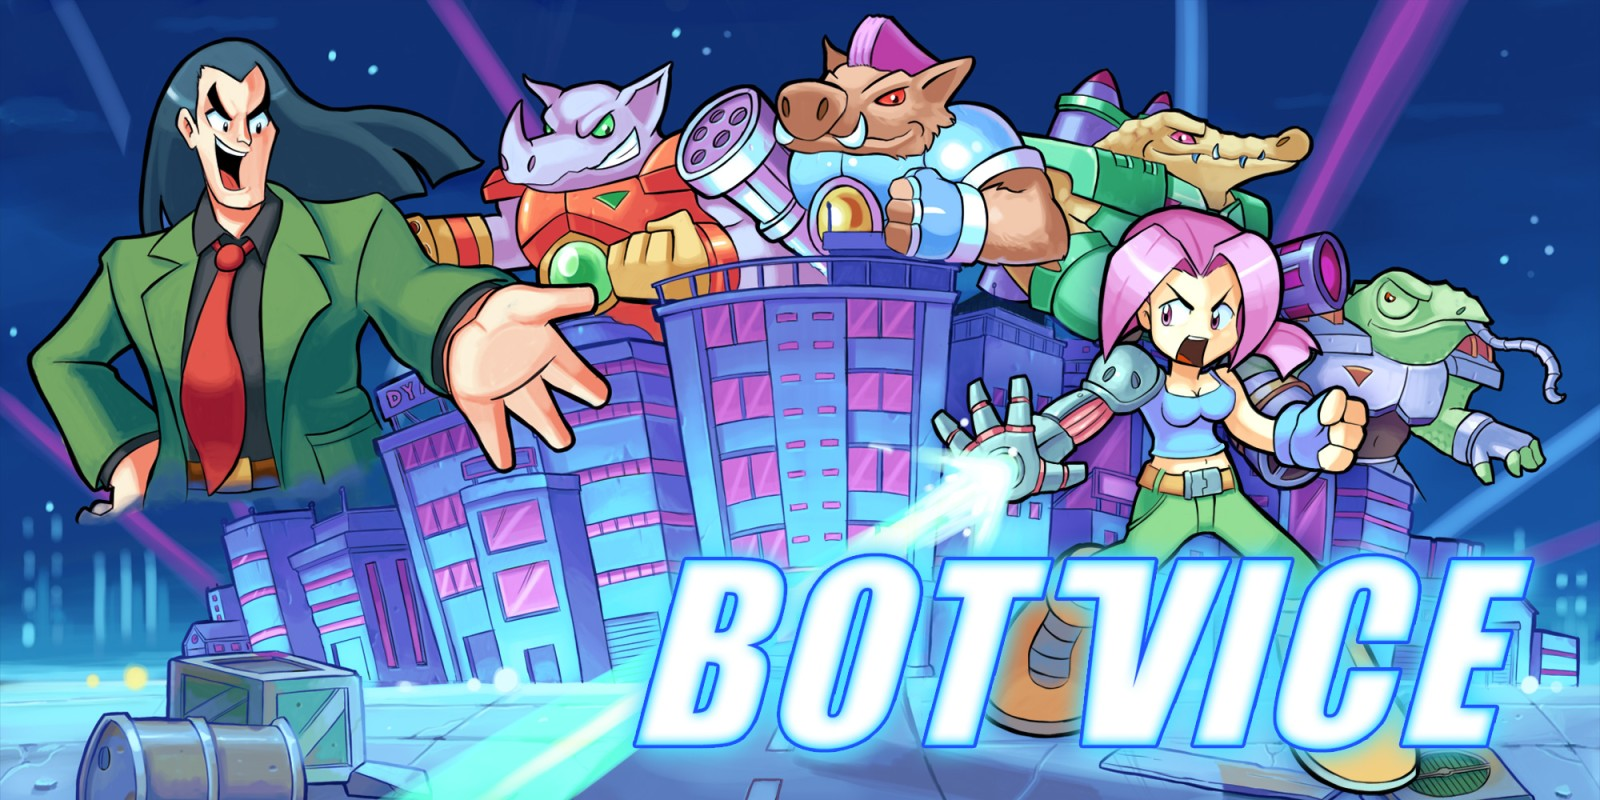 Bot Vice | Nintendo Switch download software | Games | Nintendo